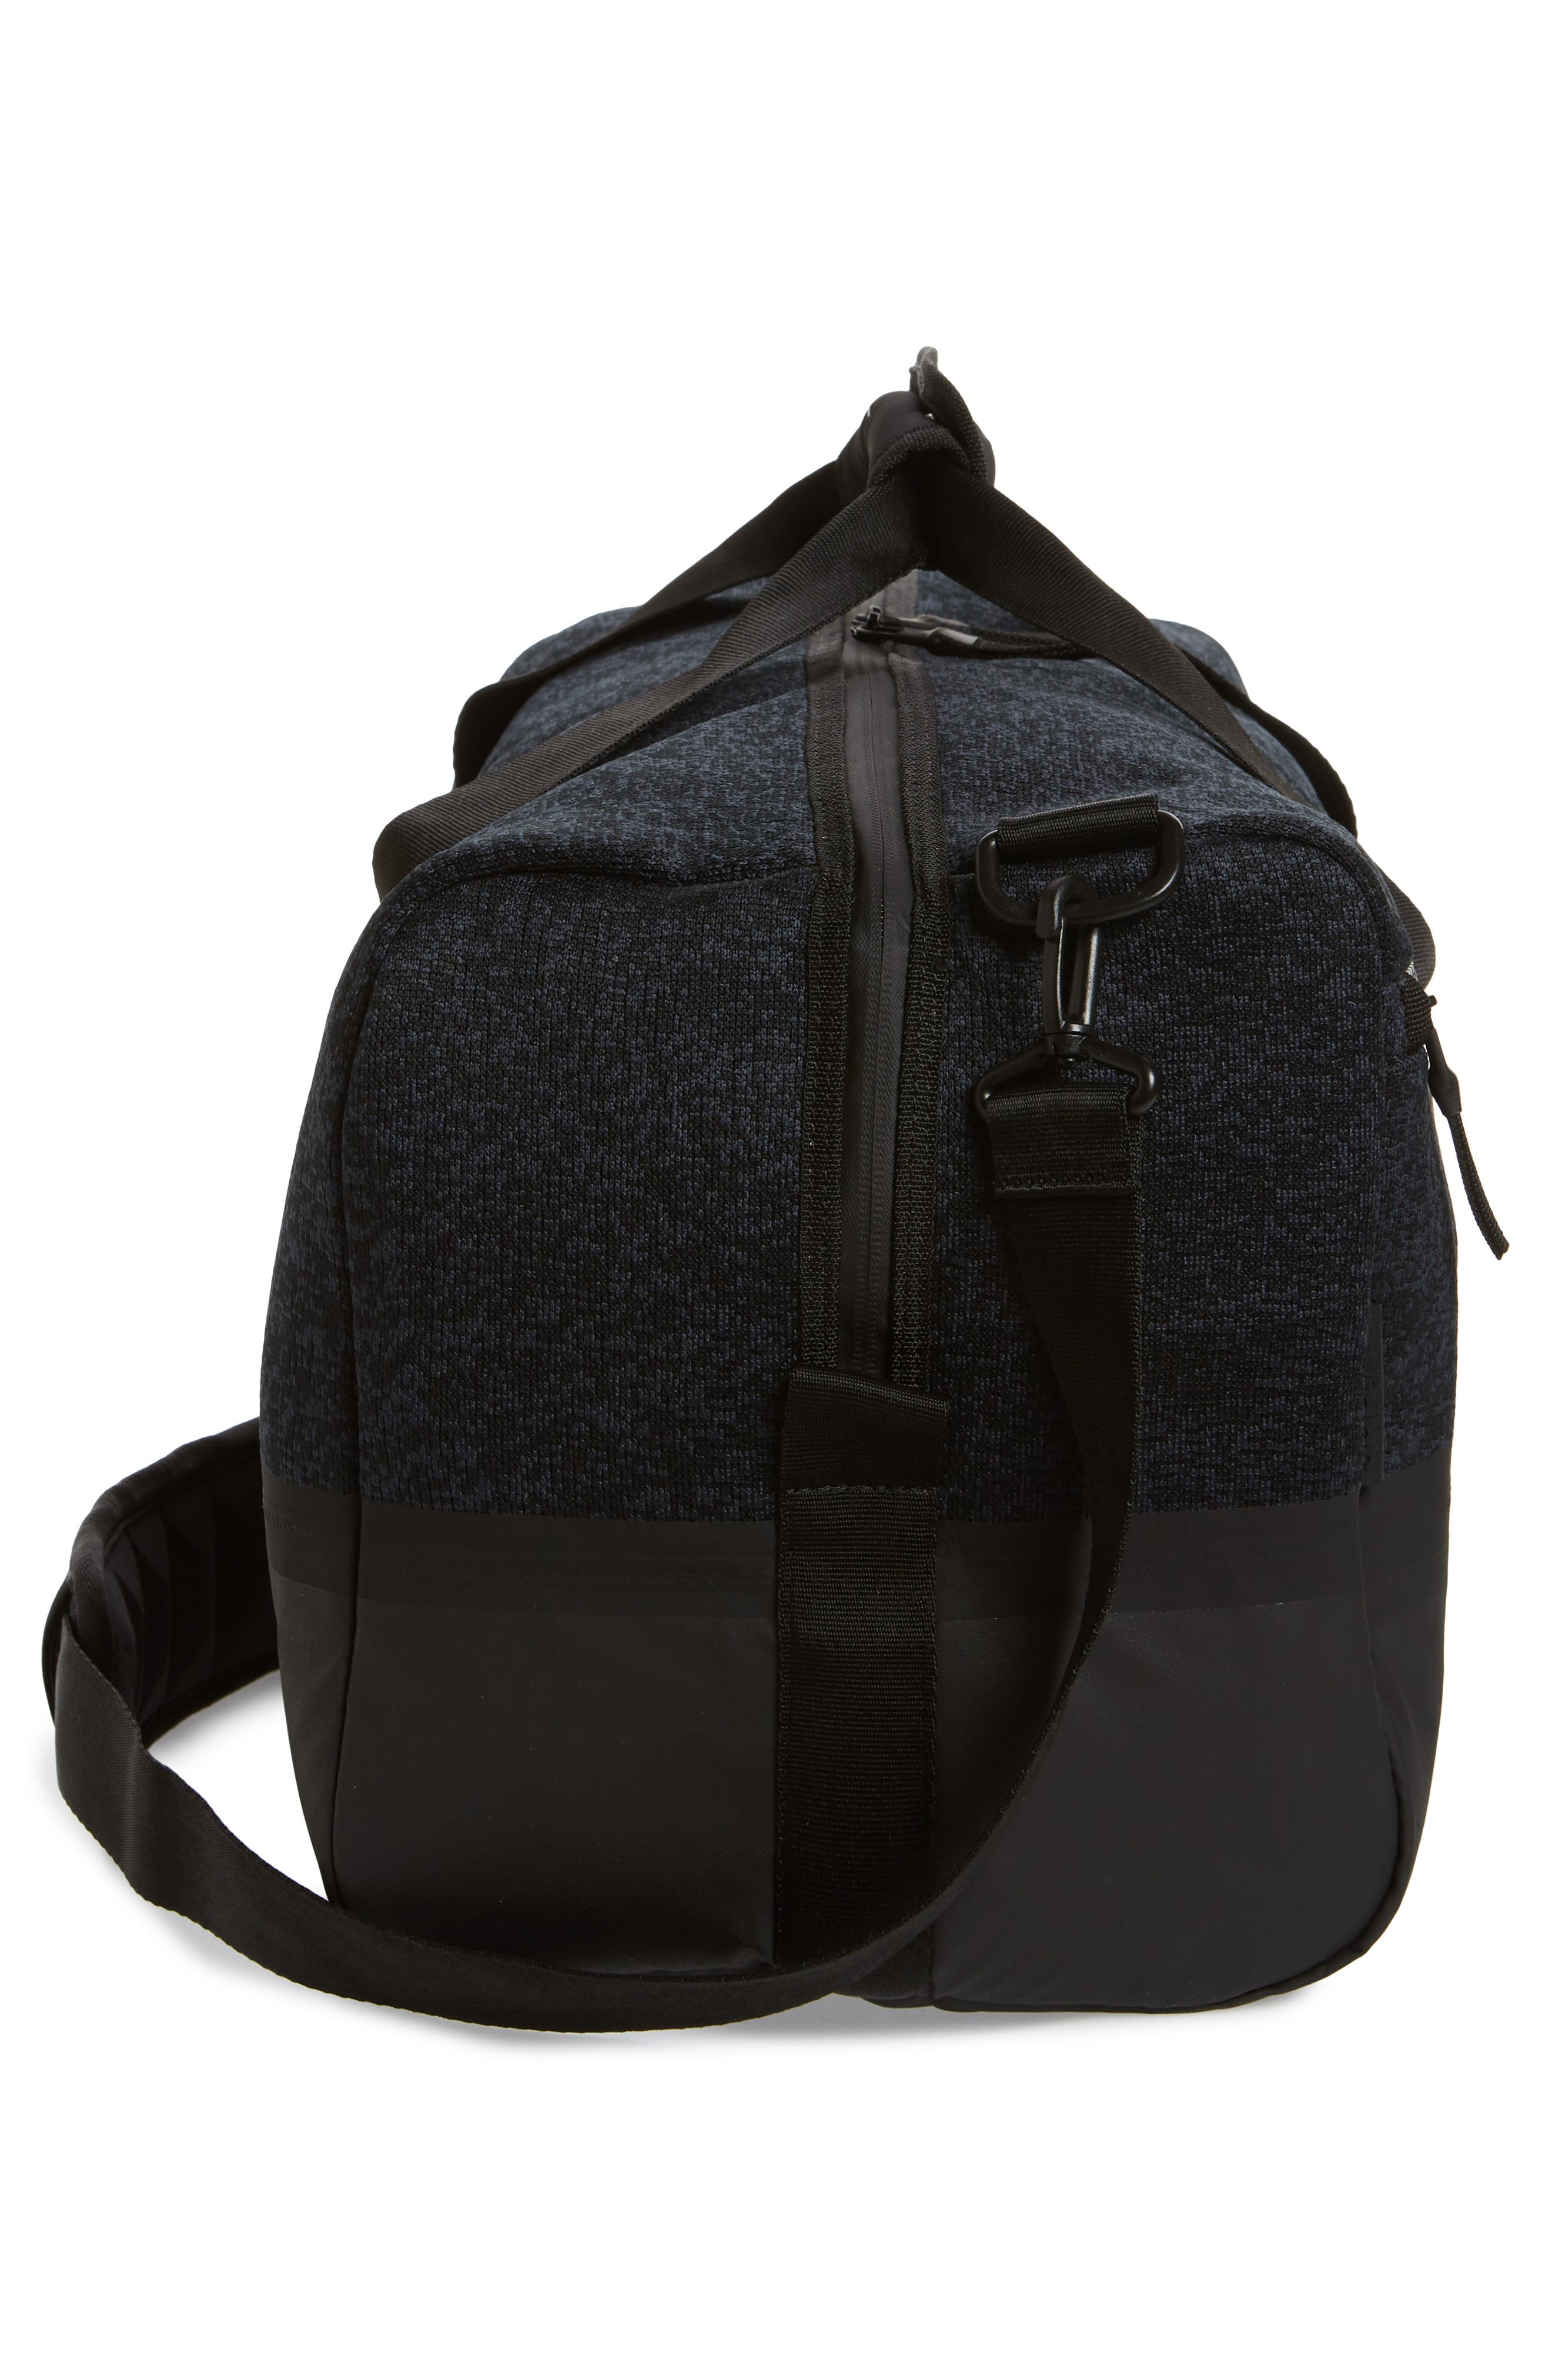 ADIDAS ORIGINALS, PK Amplifier Duffle Bag, Alternate thumbnail 5, color, GREY/ BLACK